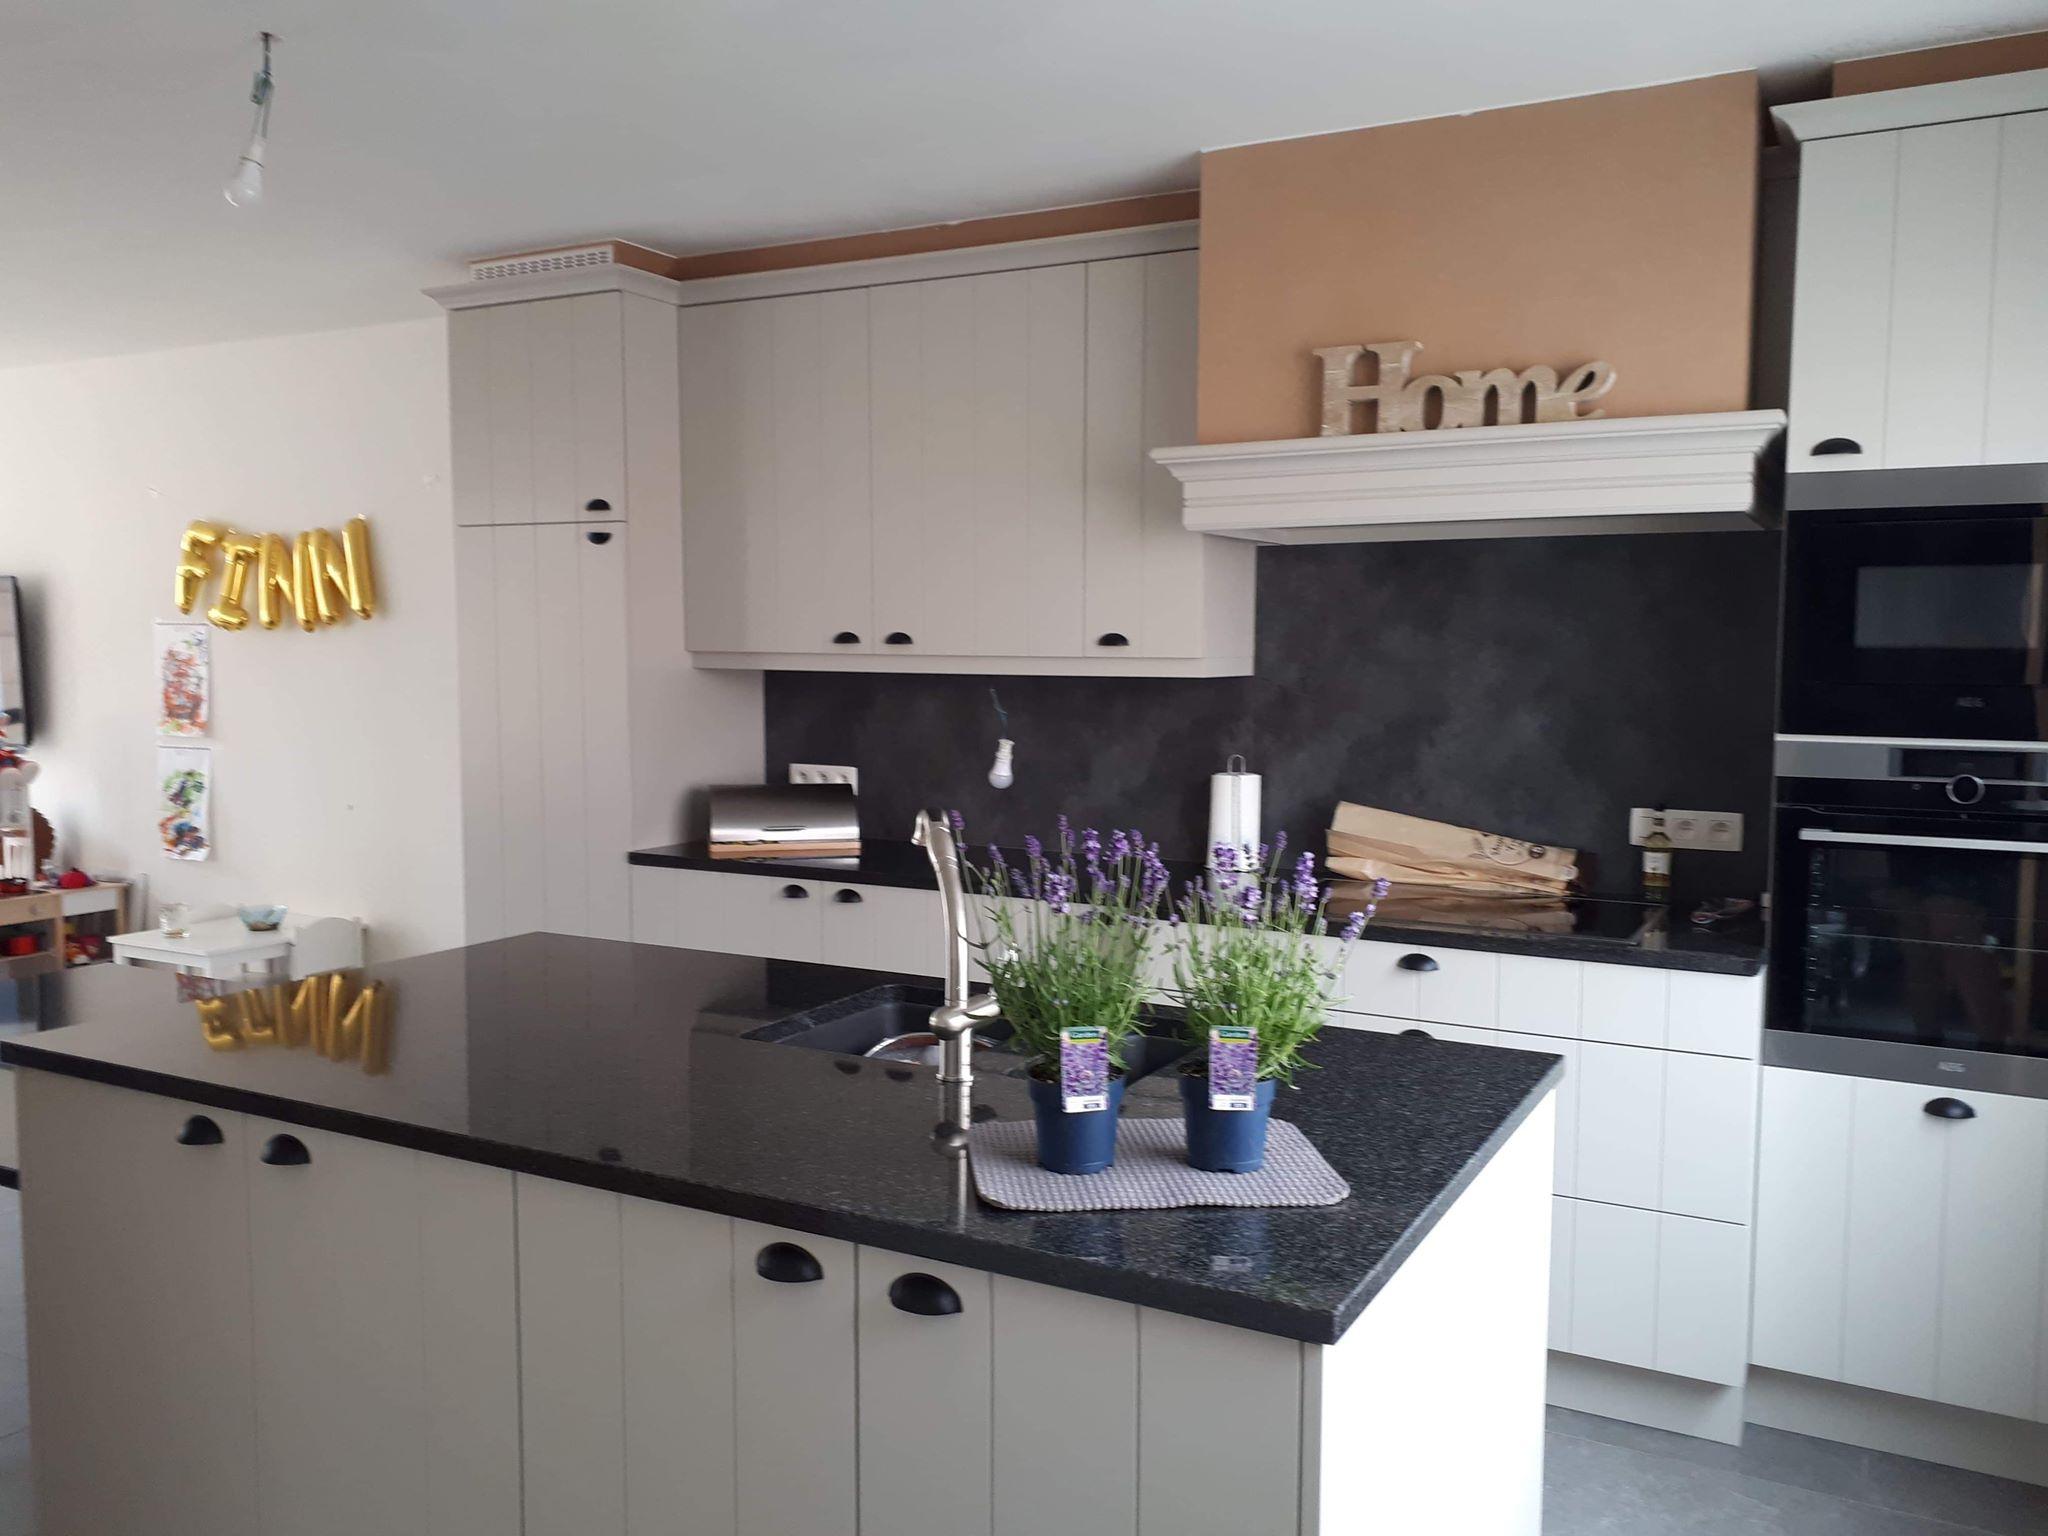 Idee Keukens Roeselare : Dovy keukens ervaringen ervaringen met dovy keukens